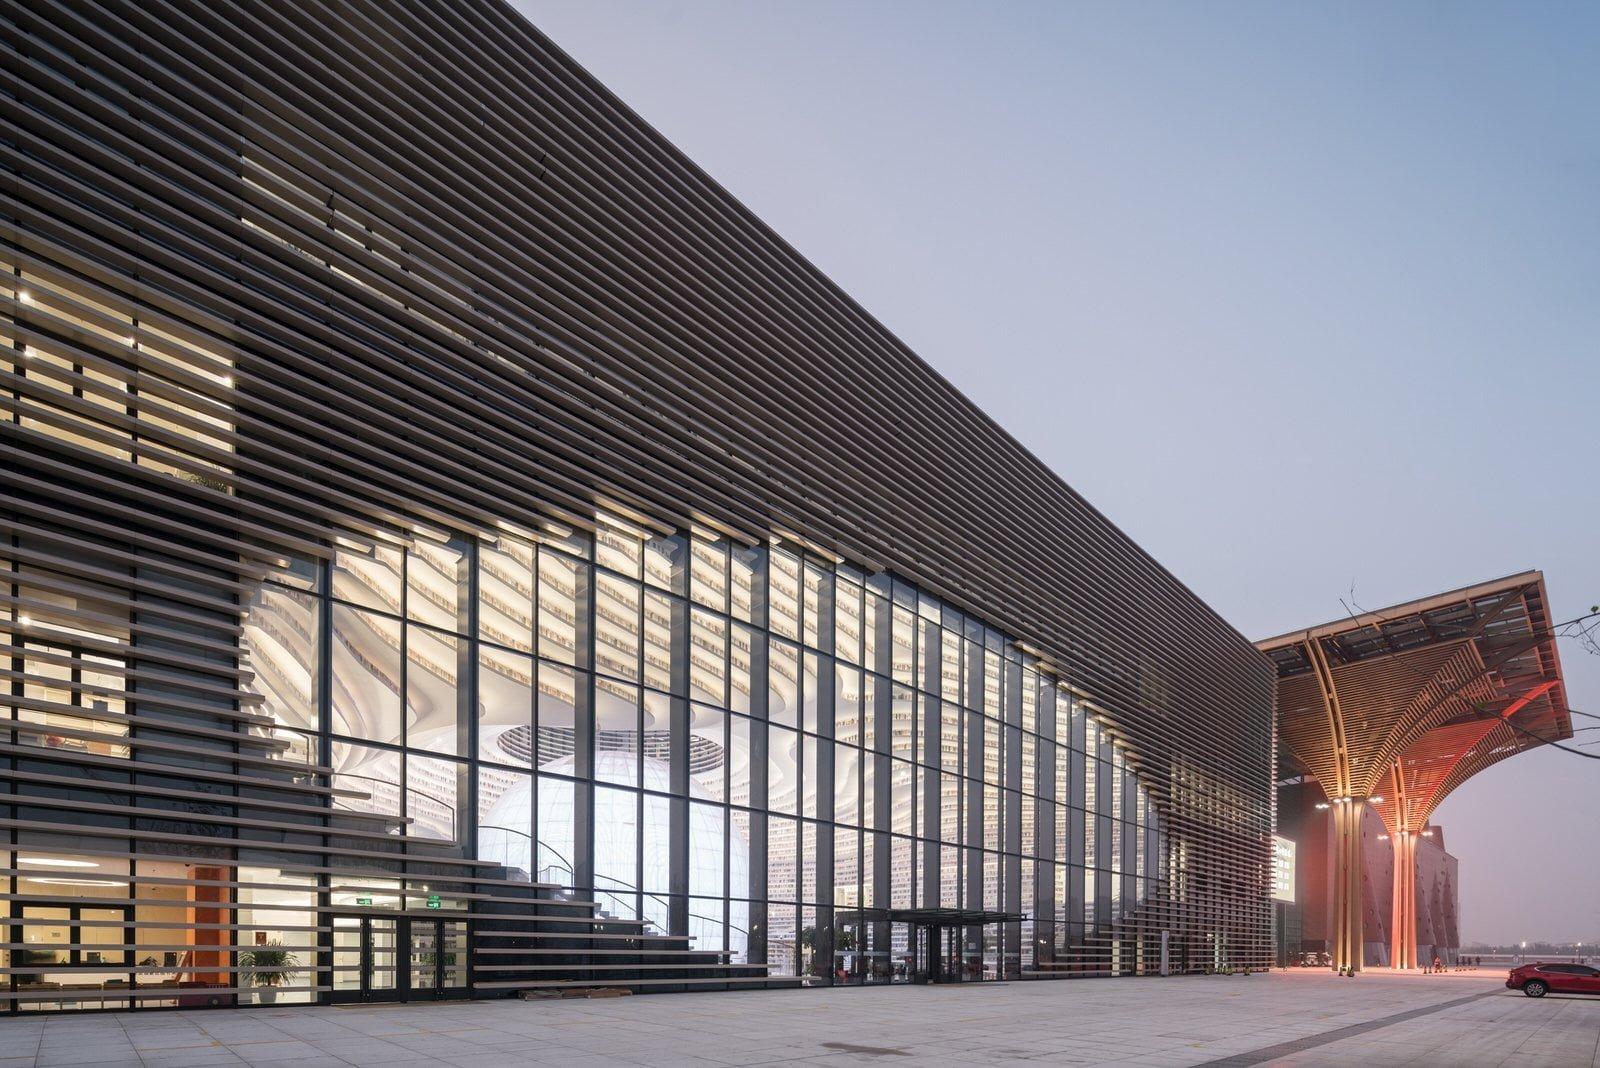 Tianjin Binhai Kütüphanesi